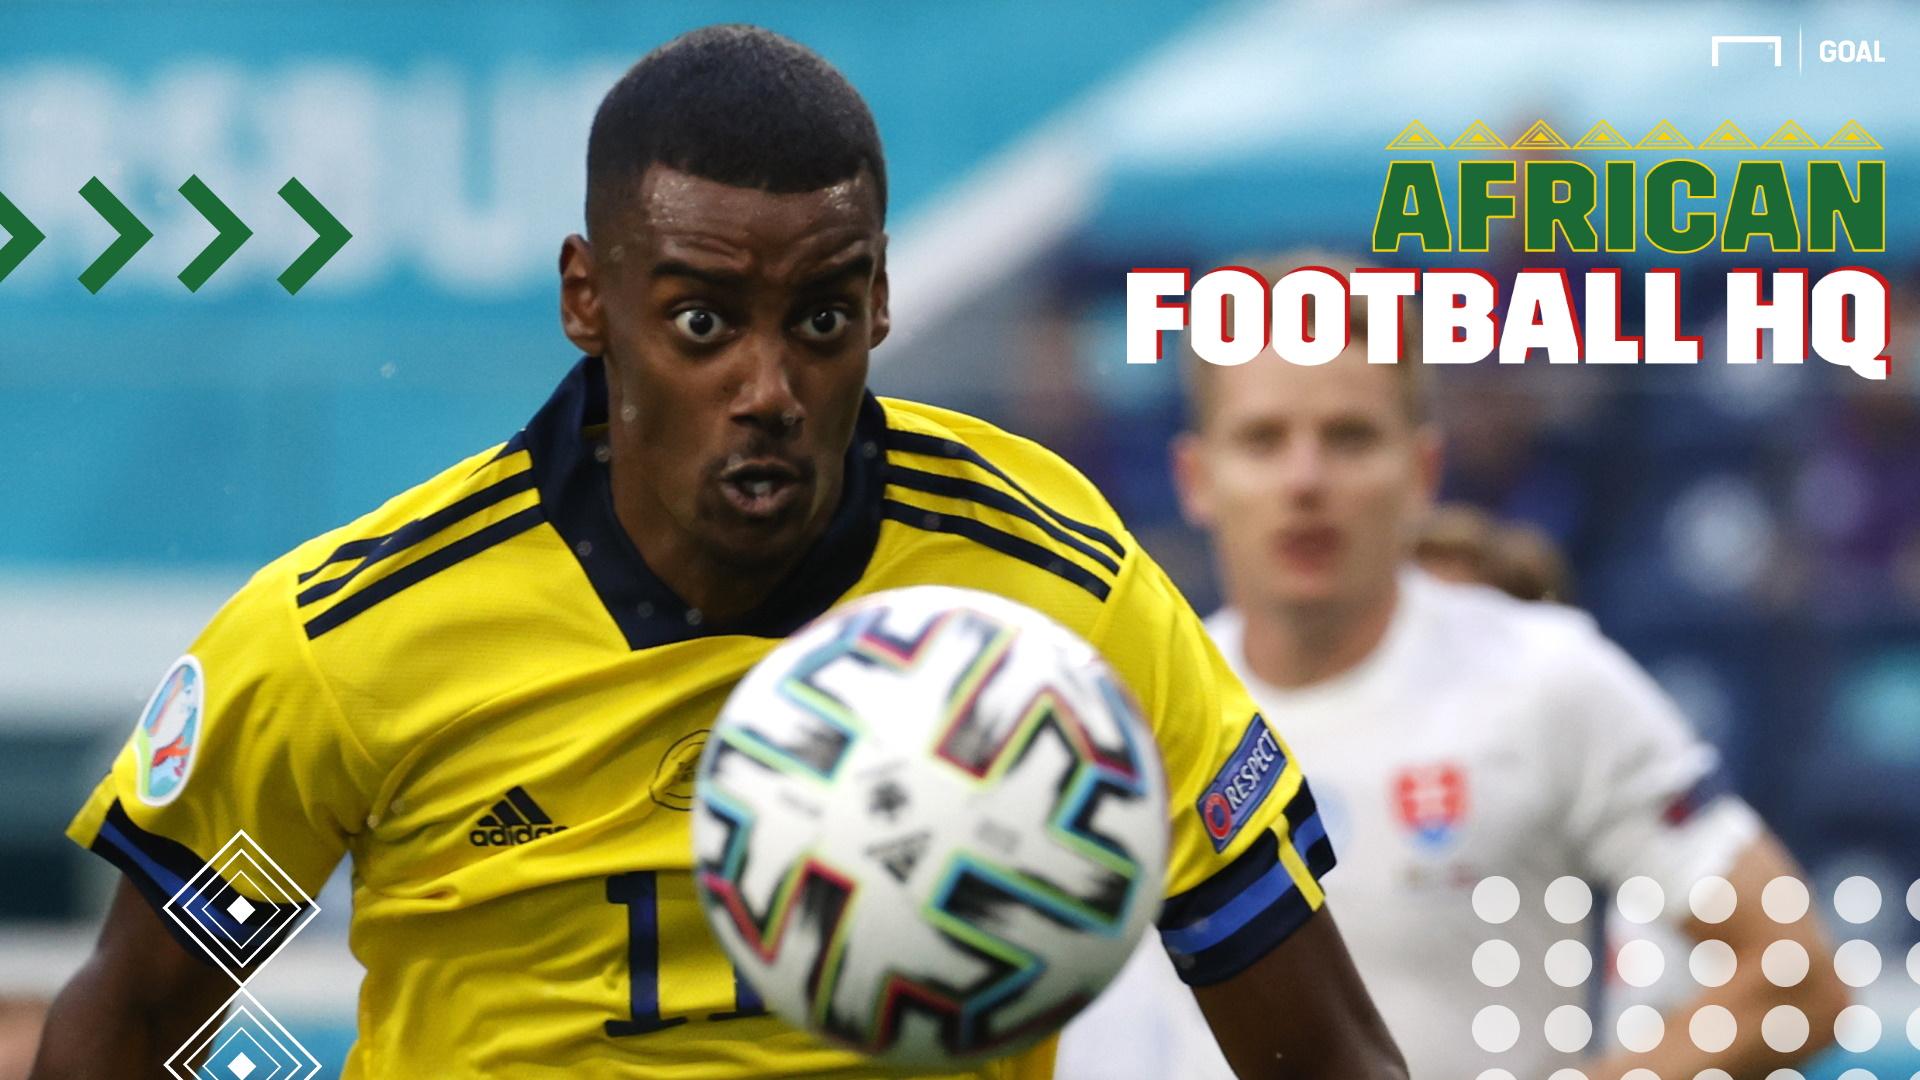 Alexander Isak: Africa's star man at the Euros so far? - African Football HQ